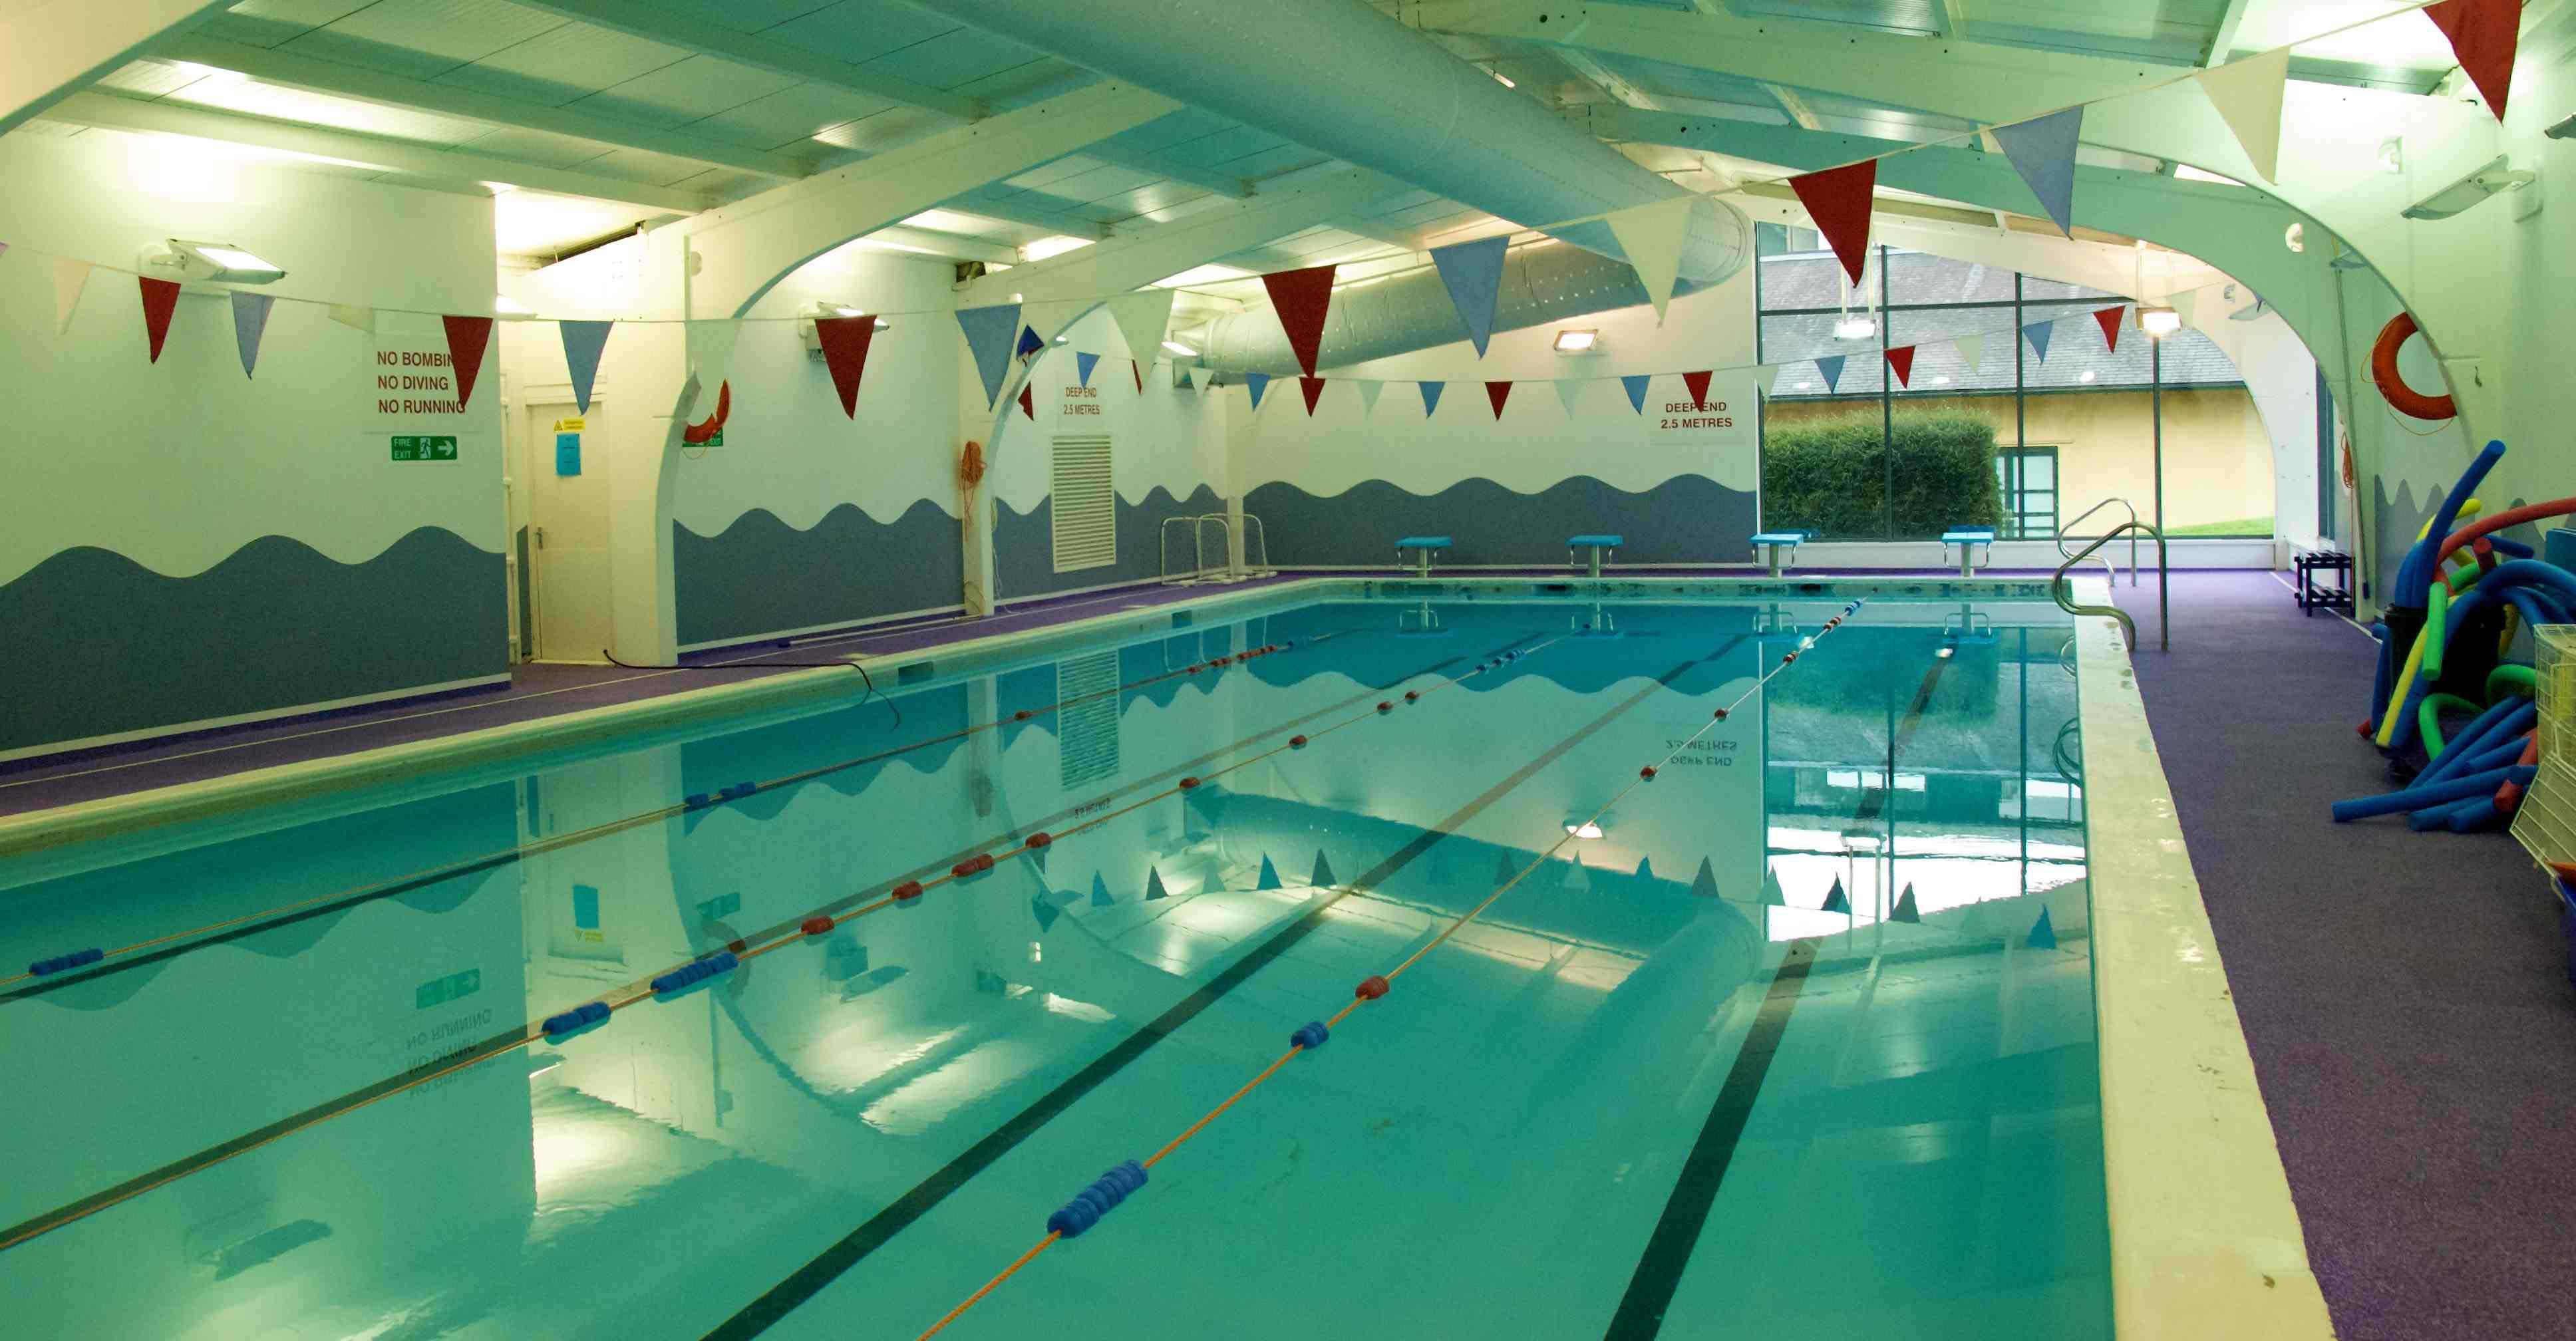 019. Swimming Pool